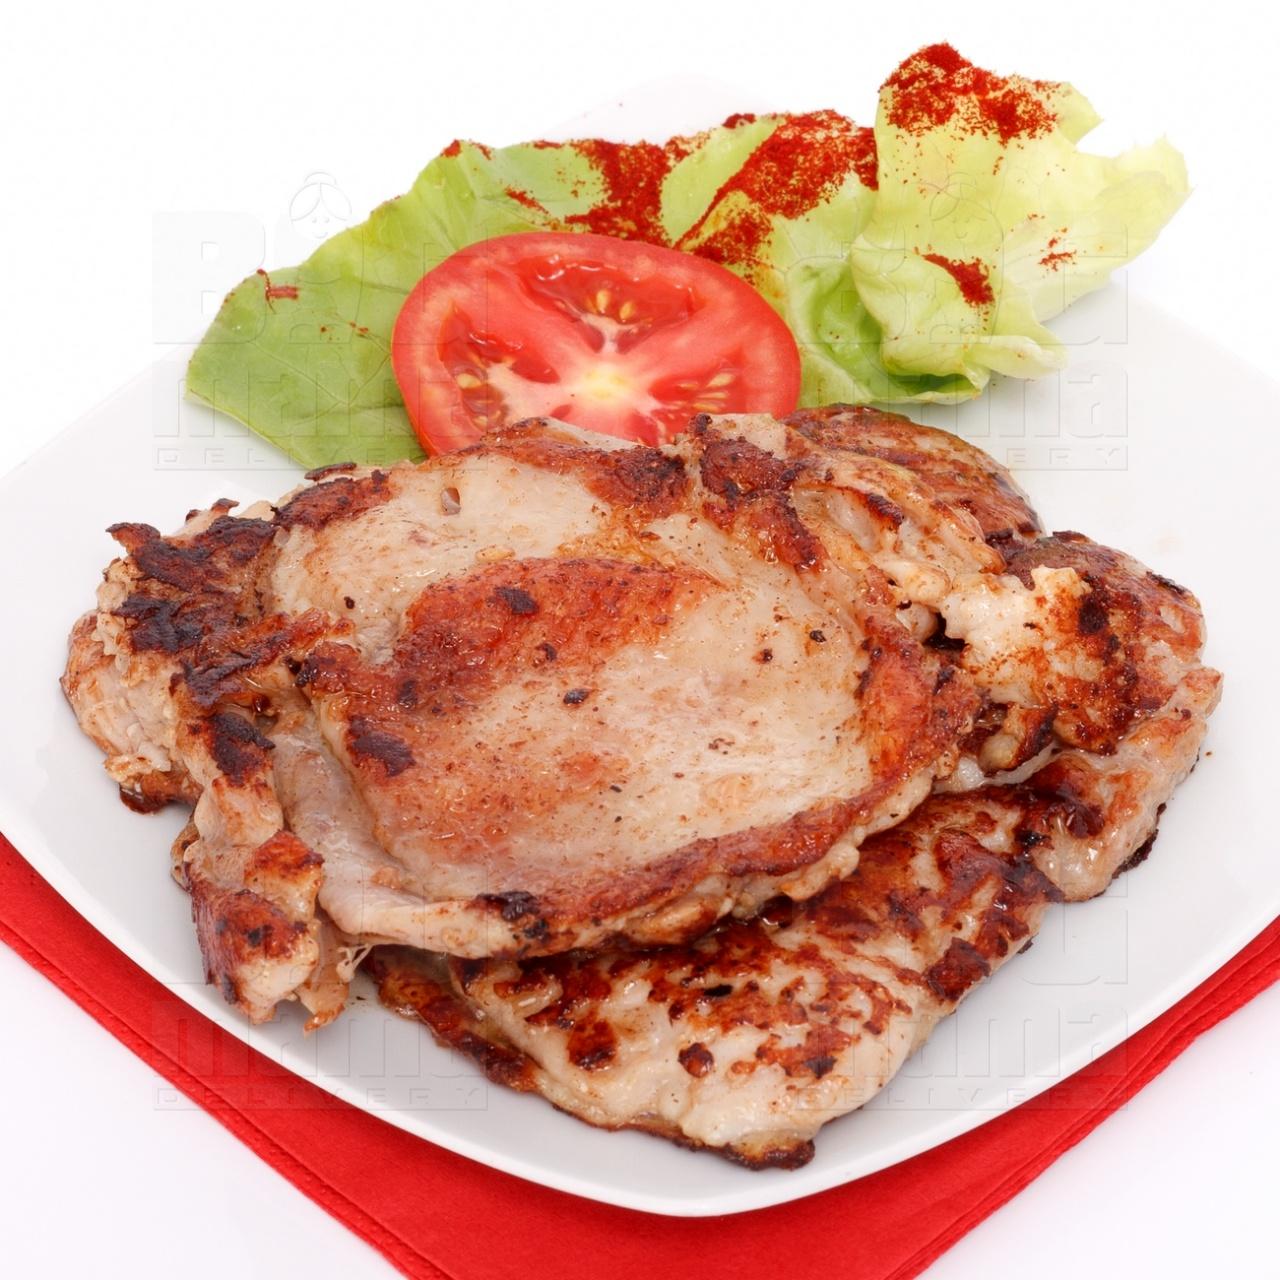 Product #9 image - Pulpă pui la grătar